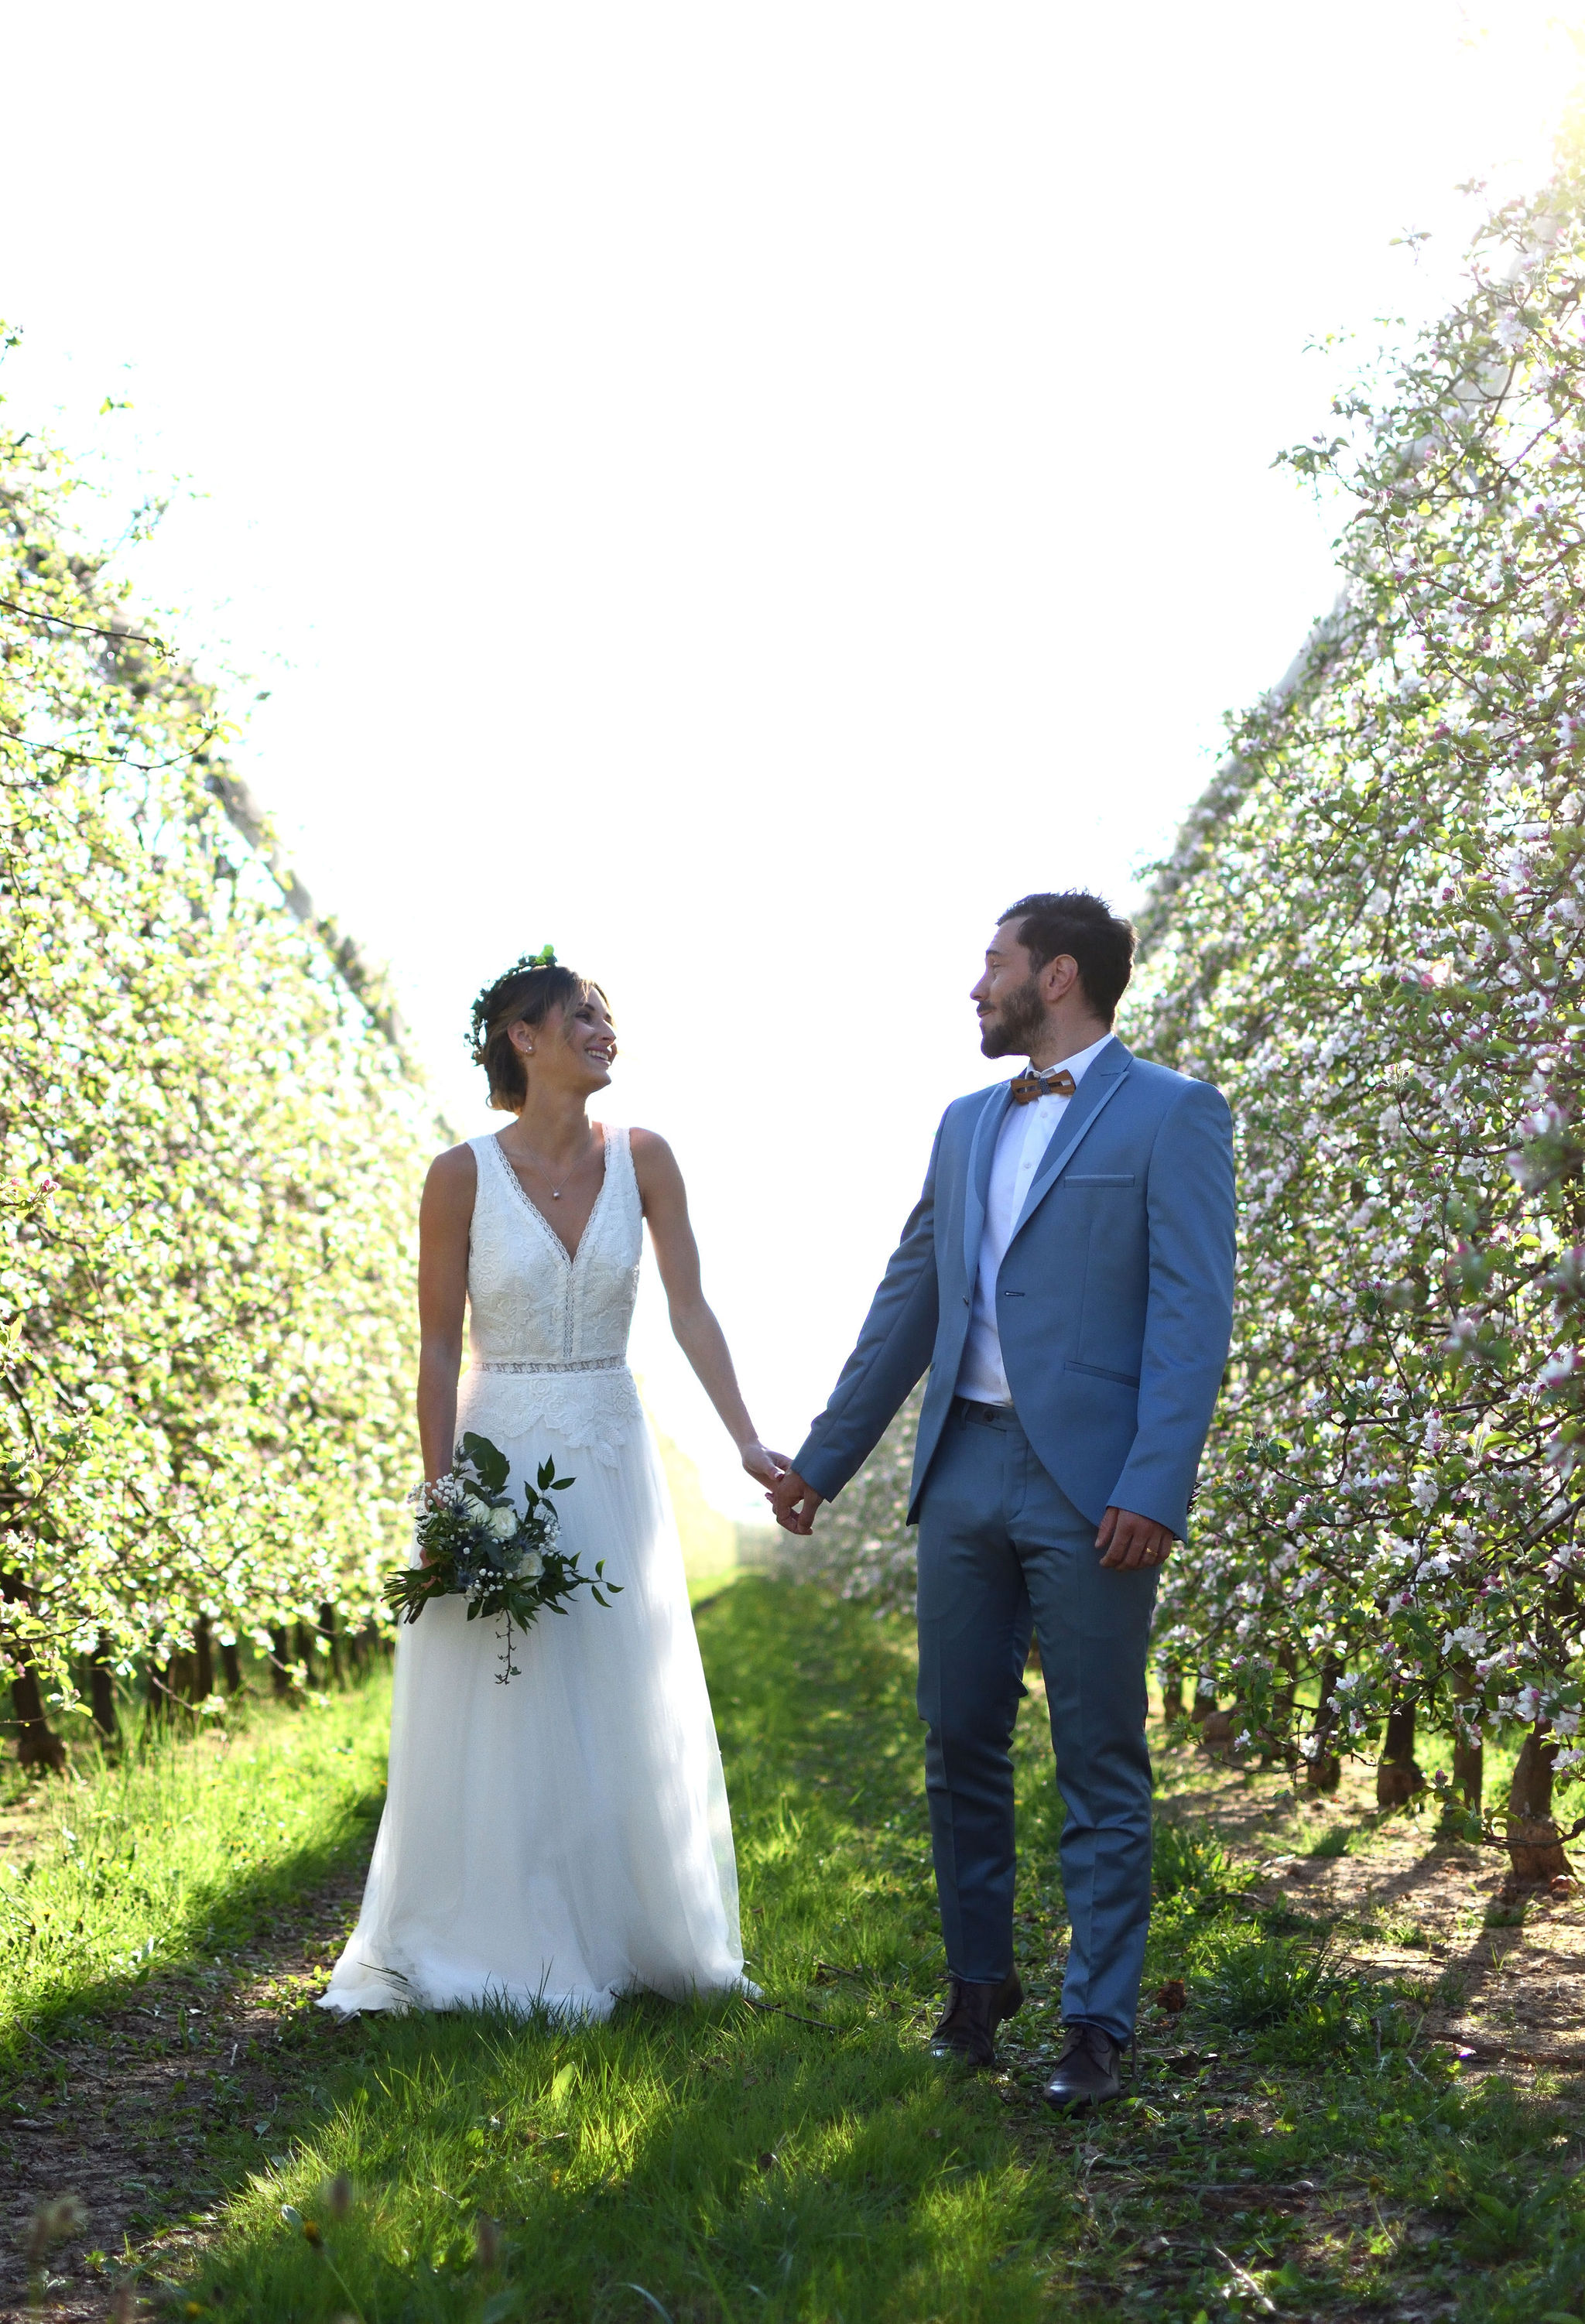 mariage-printanier-romanersphotographie(18)